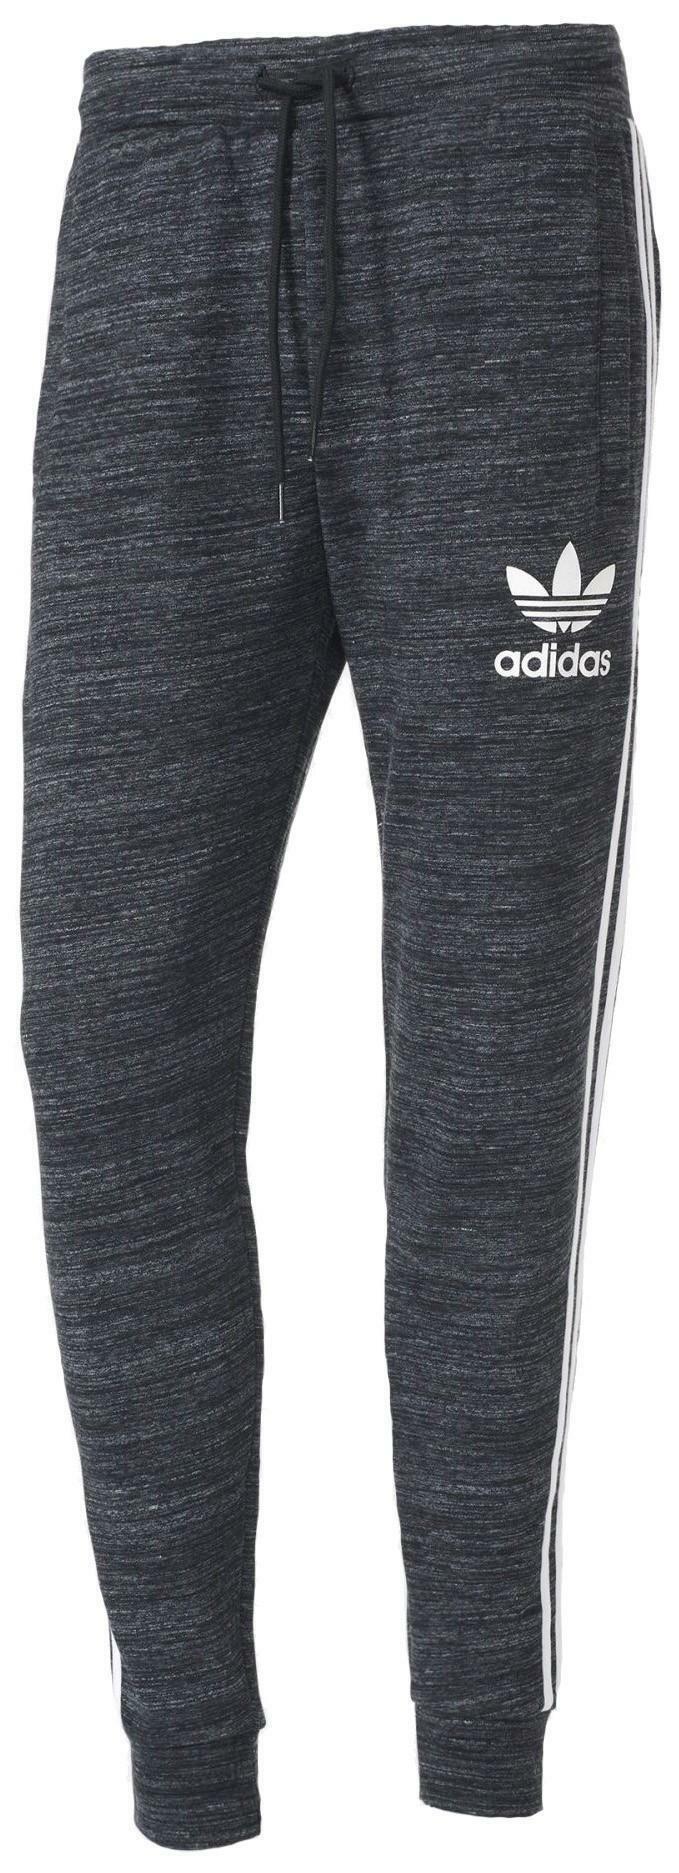 adidas adidas originals clfn pantaloni tuta uomo grigi